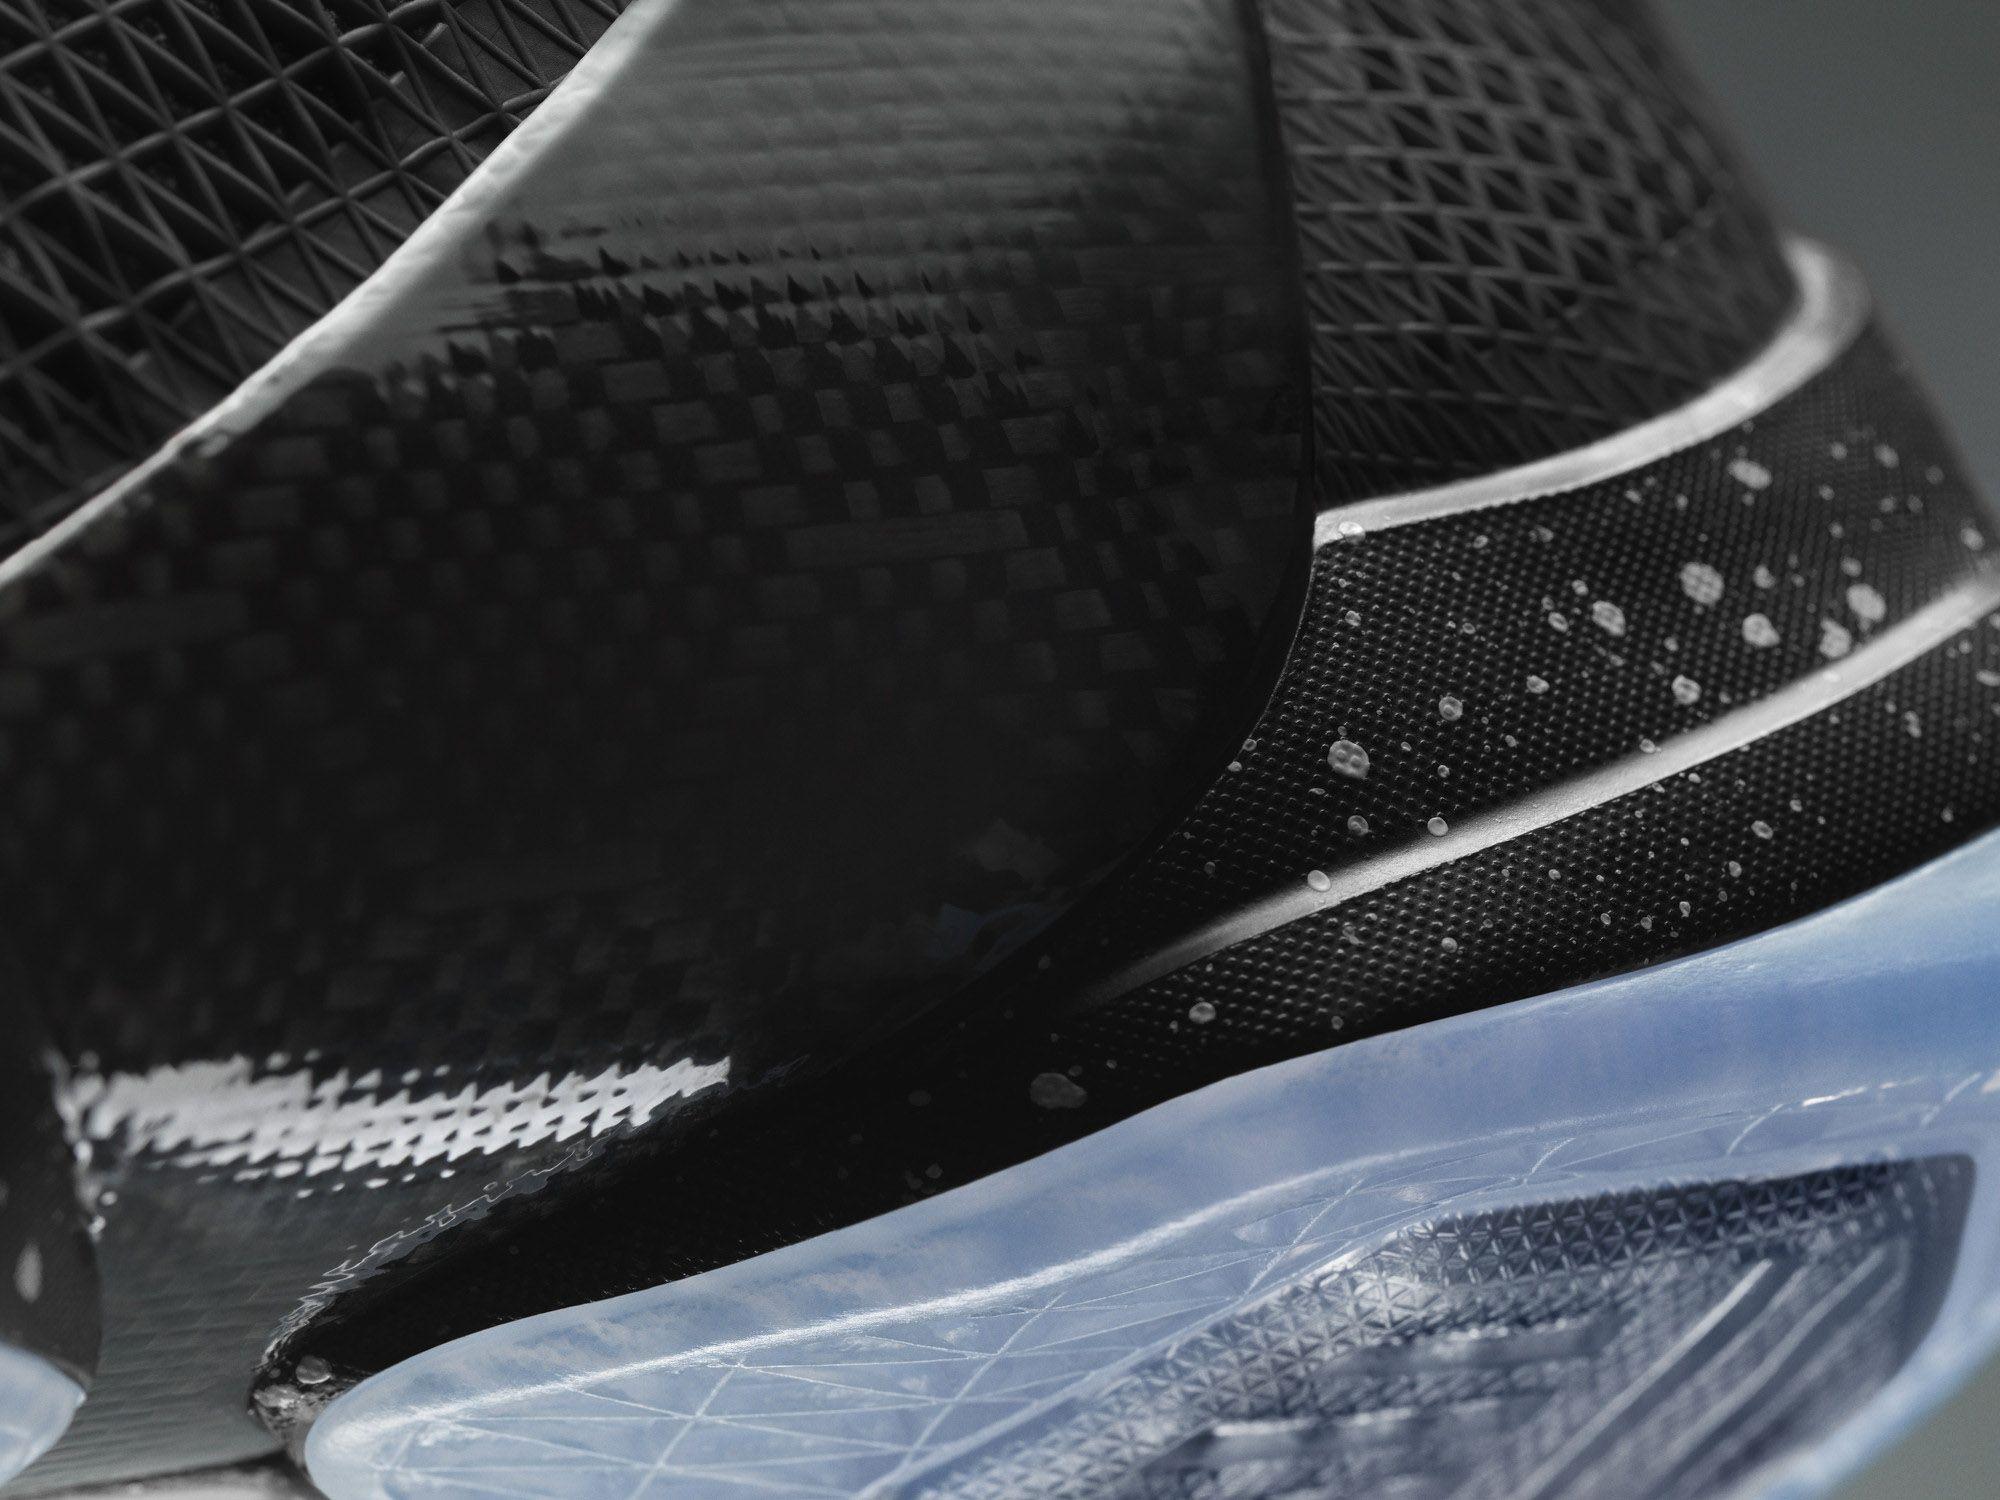 Der neue Nike LeBron 13 Elite,  #LeBron13 #LeBron13Elite #LebronJames #nike #sneaker, #agpos, #sneaker, #sneakers, #sneakerhead, #solecollector, #sneakerfreaker,  #nicekicks, #kicks, #kotd, #kicks4eva #kicks0l0gy, #kicksonfire, #womft, #walklikeus, #schuhe, #turnschuhe, #yeezy, #nike, #adidas, #puma, #asics, #newbalance #jordan, #airjordan, #kicks